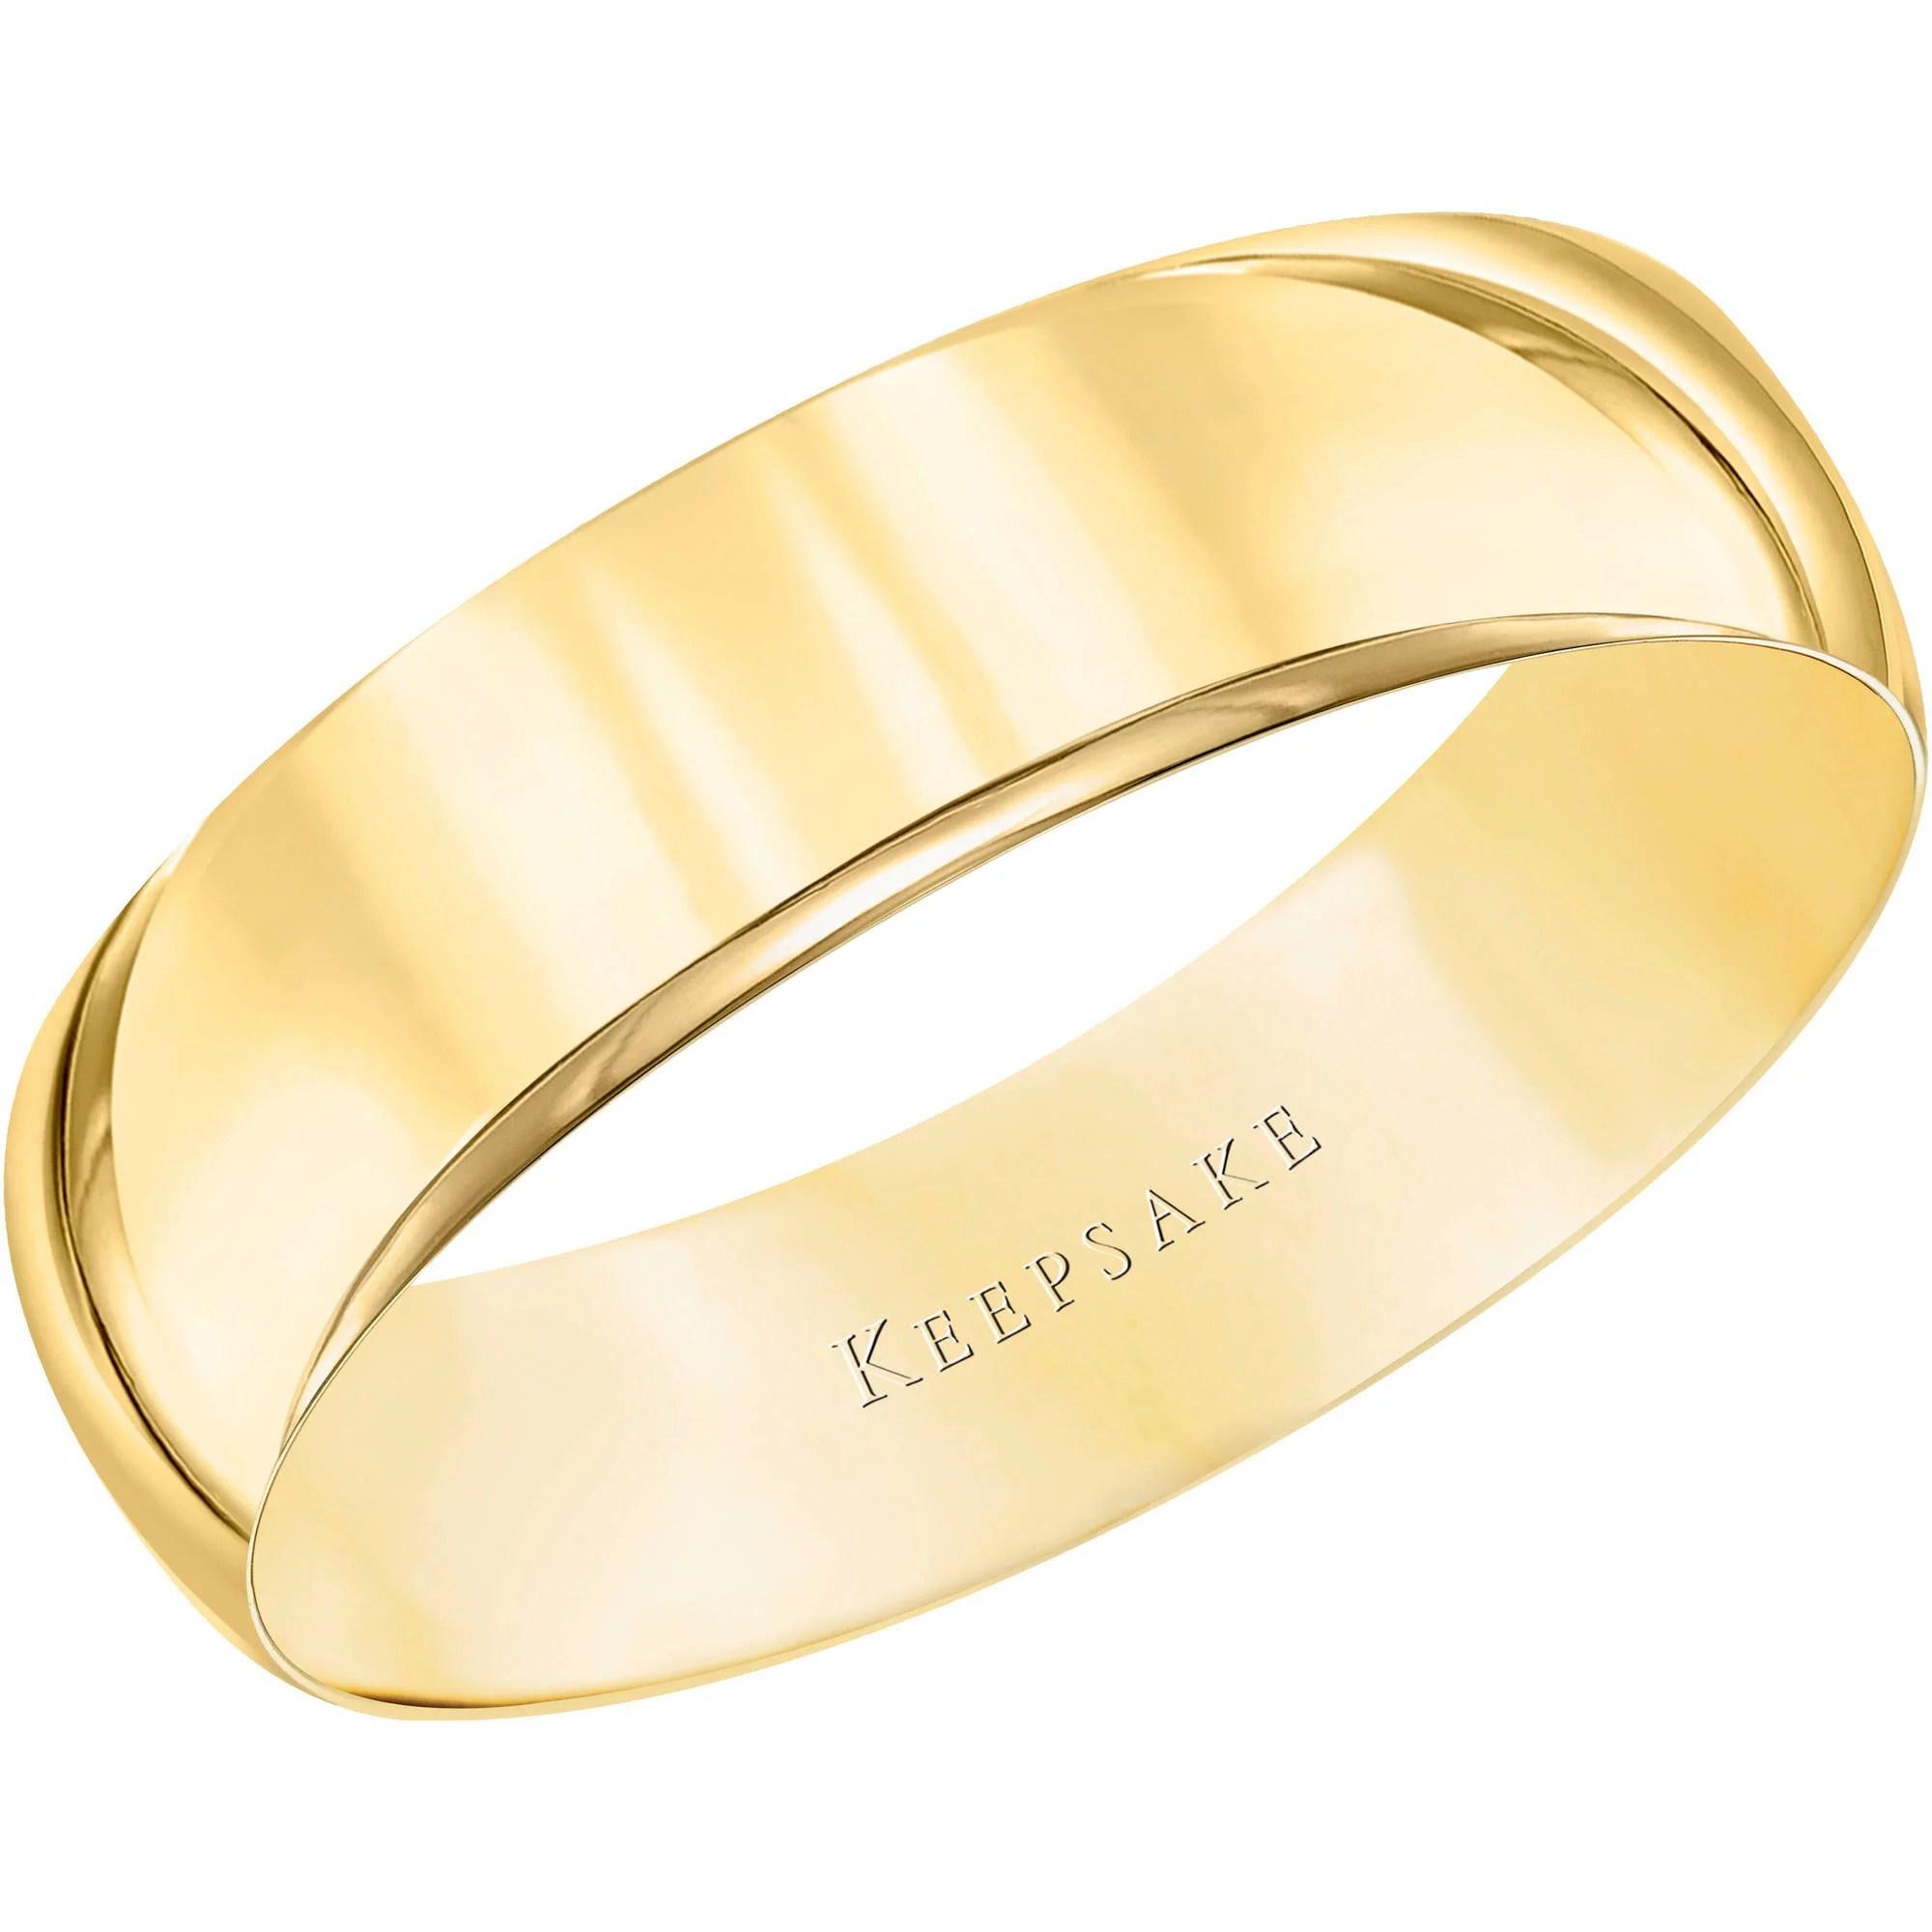 gold wedding bands Keepsake 10kt Yellow Gold Wedding Band With High Polish Finish 5mm